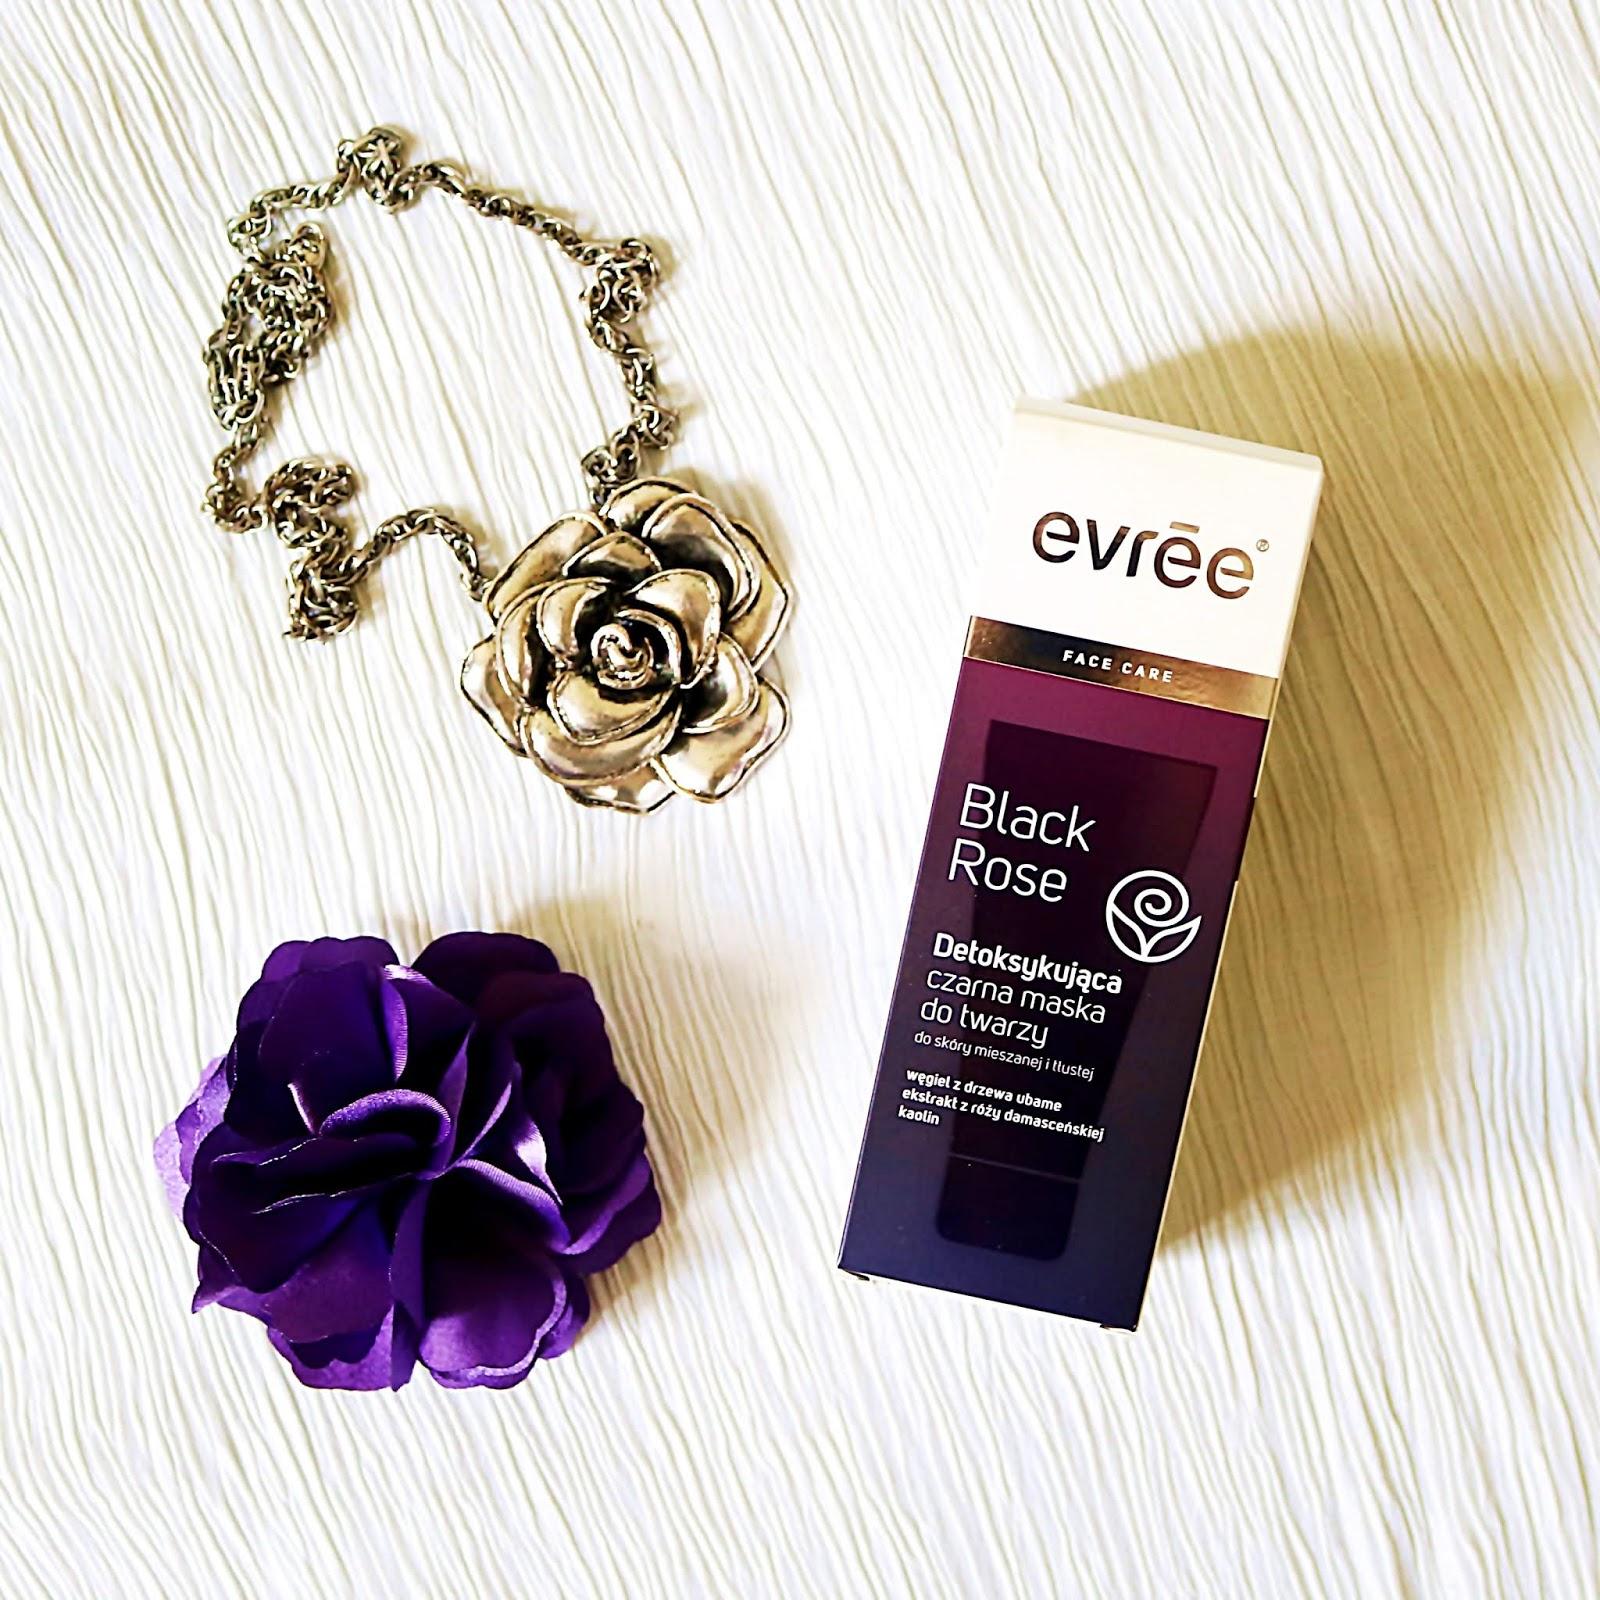 EVREE - Black Rose, detoksykująca czarna maska do twarzy